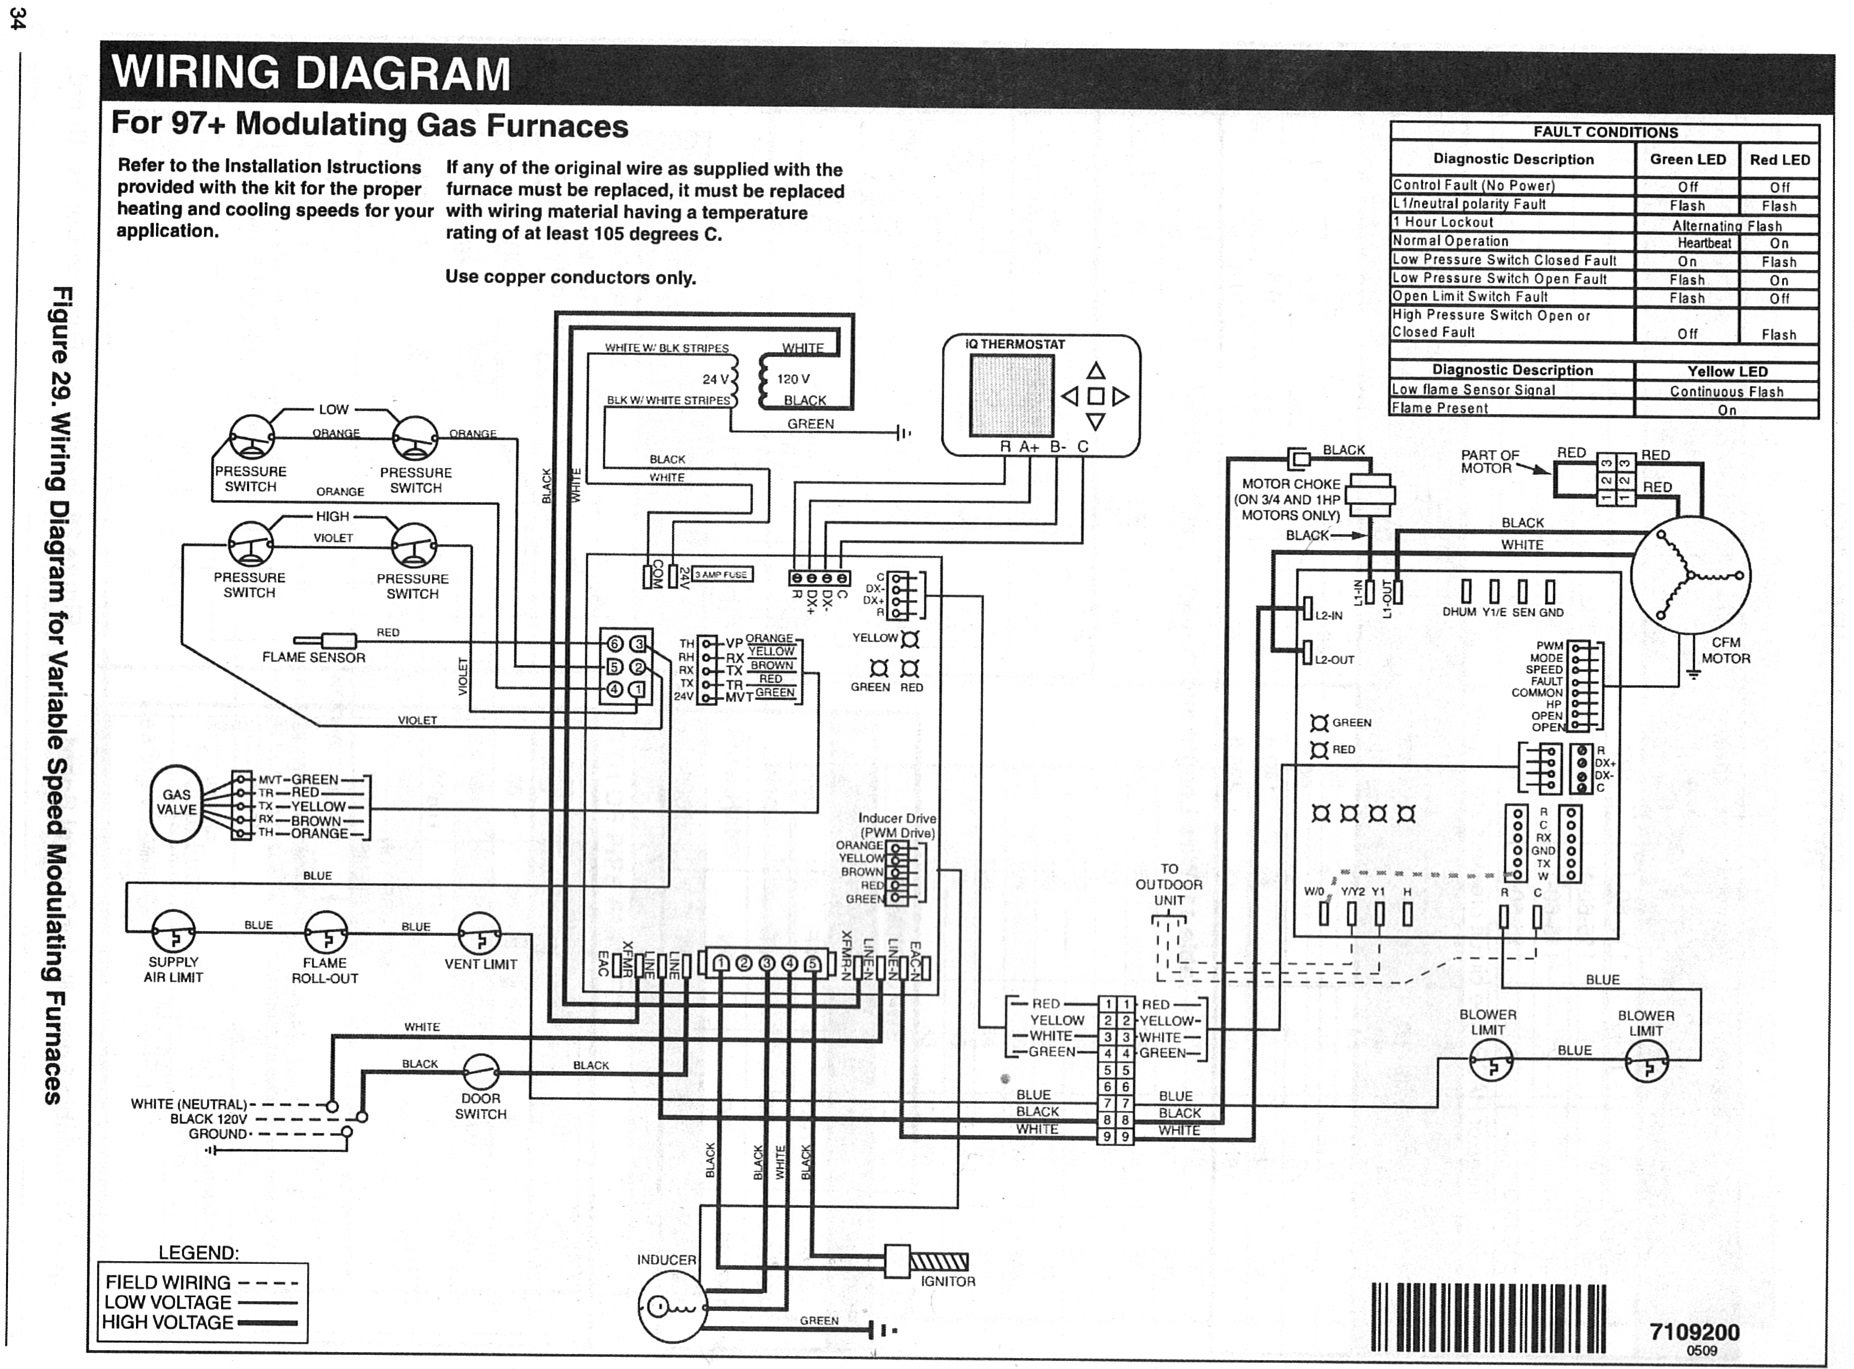 Gn90 Wiring Diagramwiring 120 Volt Capacitor Diagram Wiringresize6652c491ssl